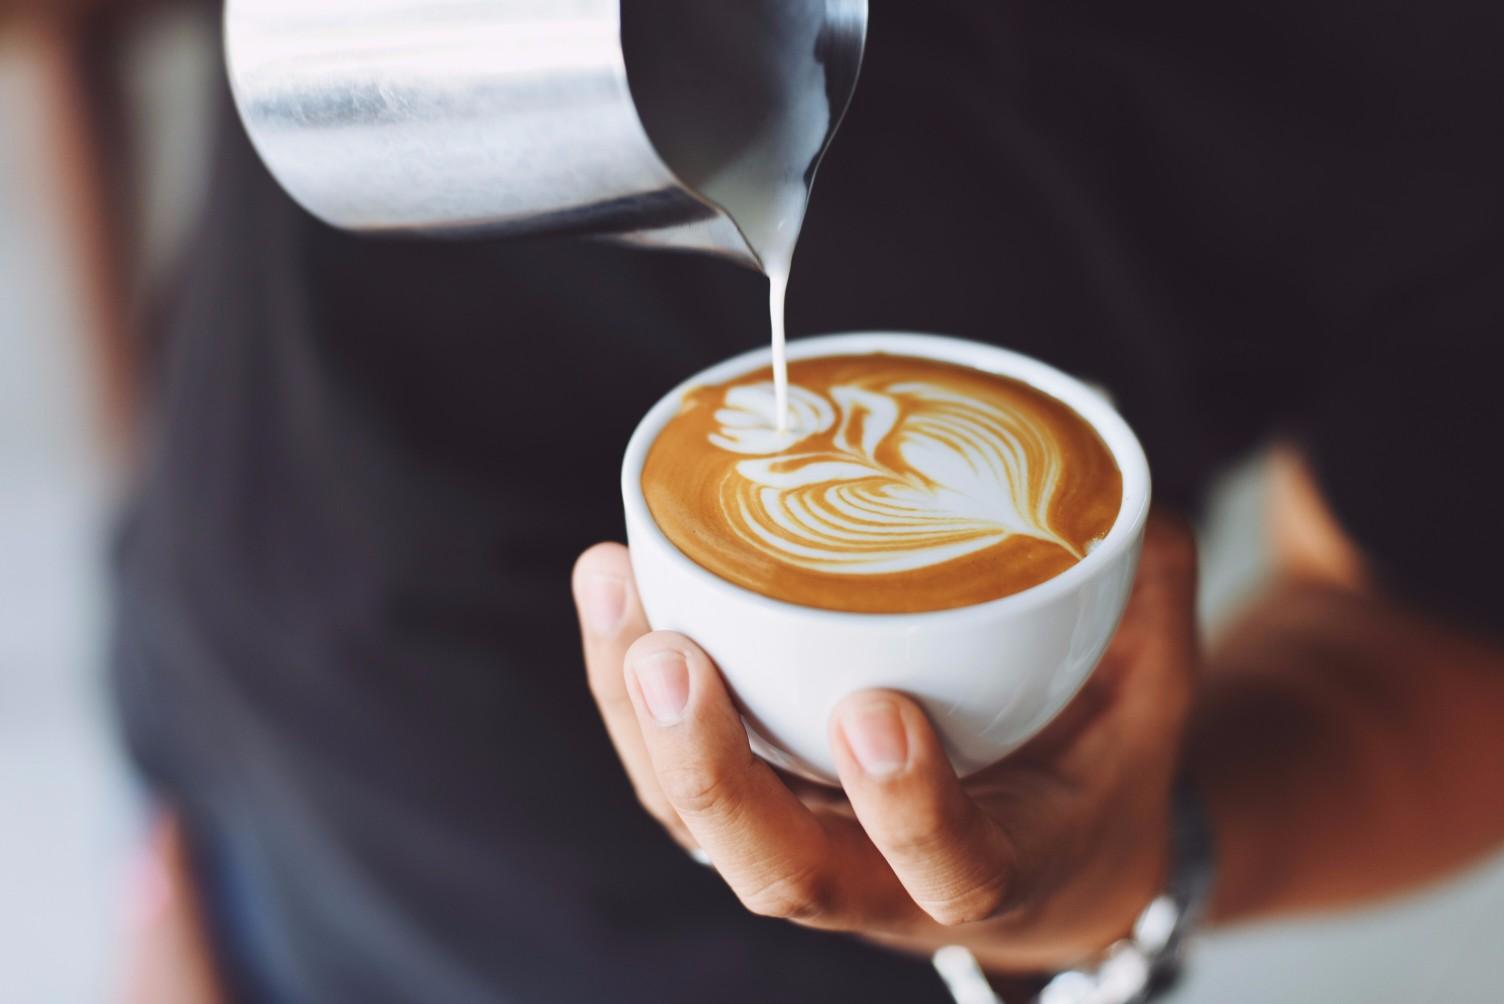 Cappuccino Market